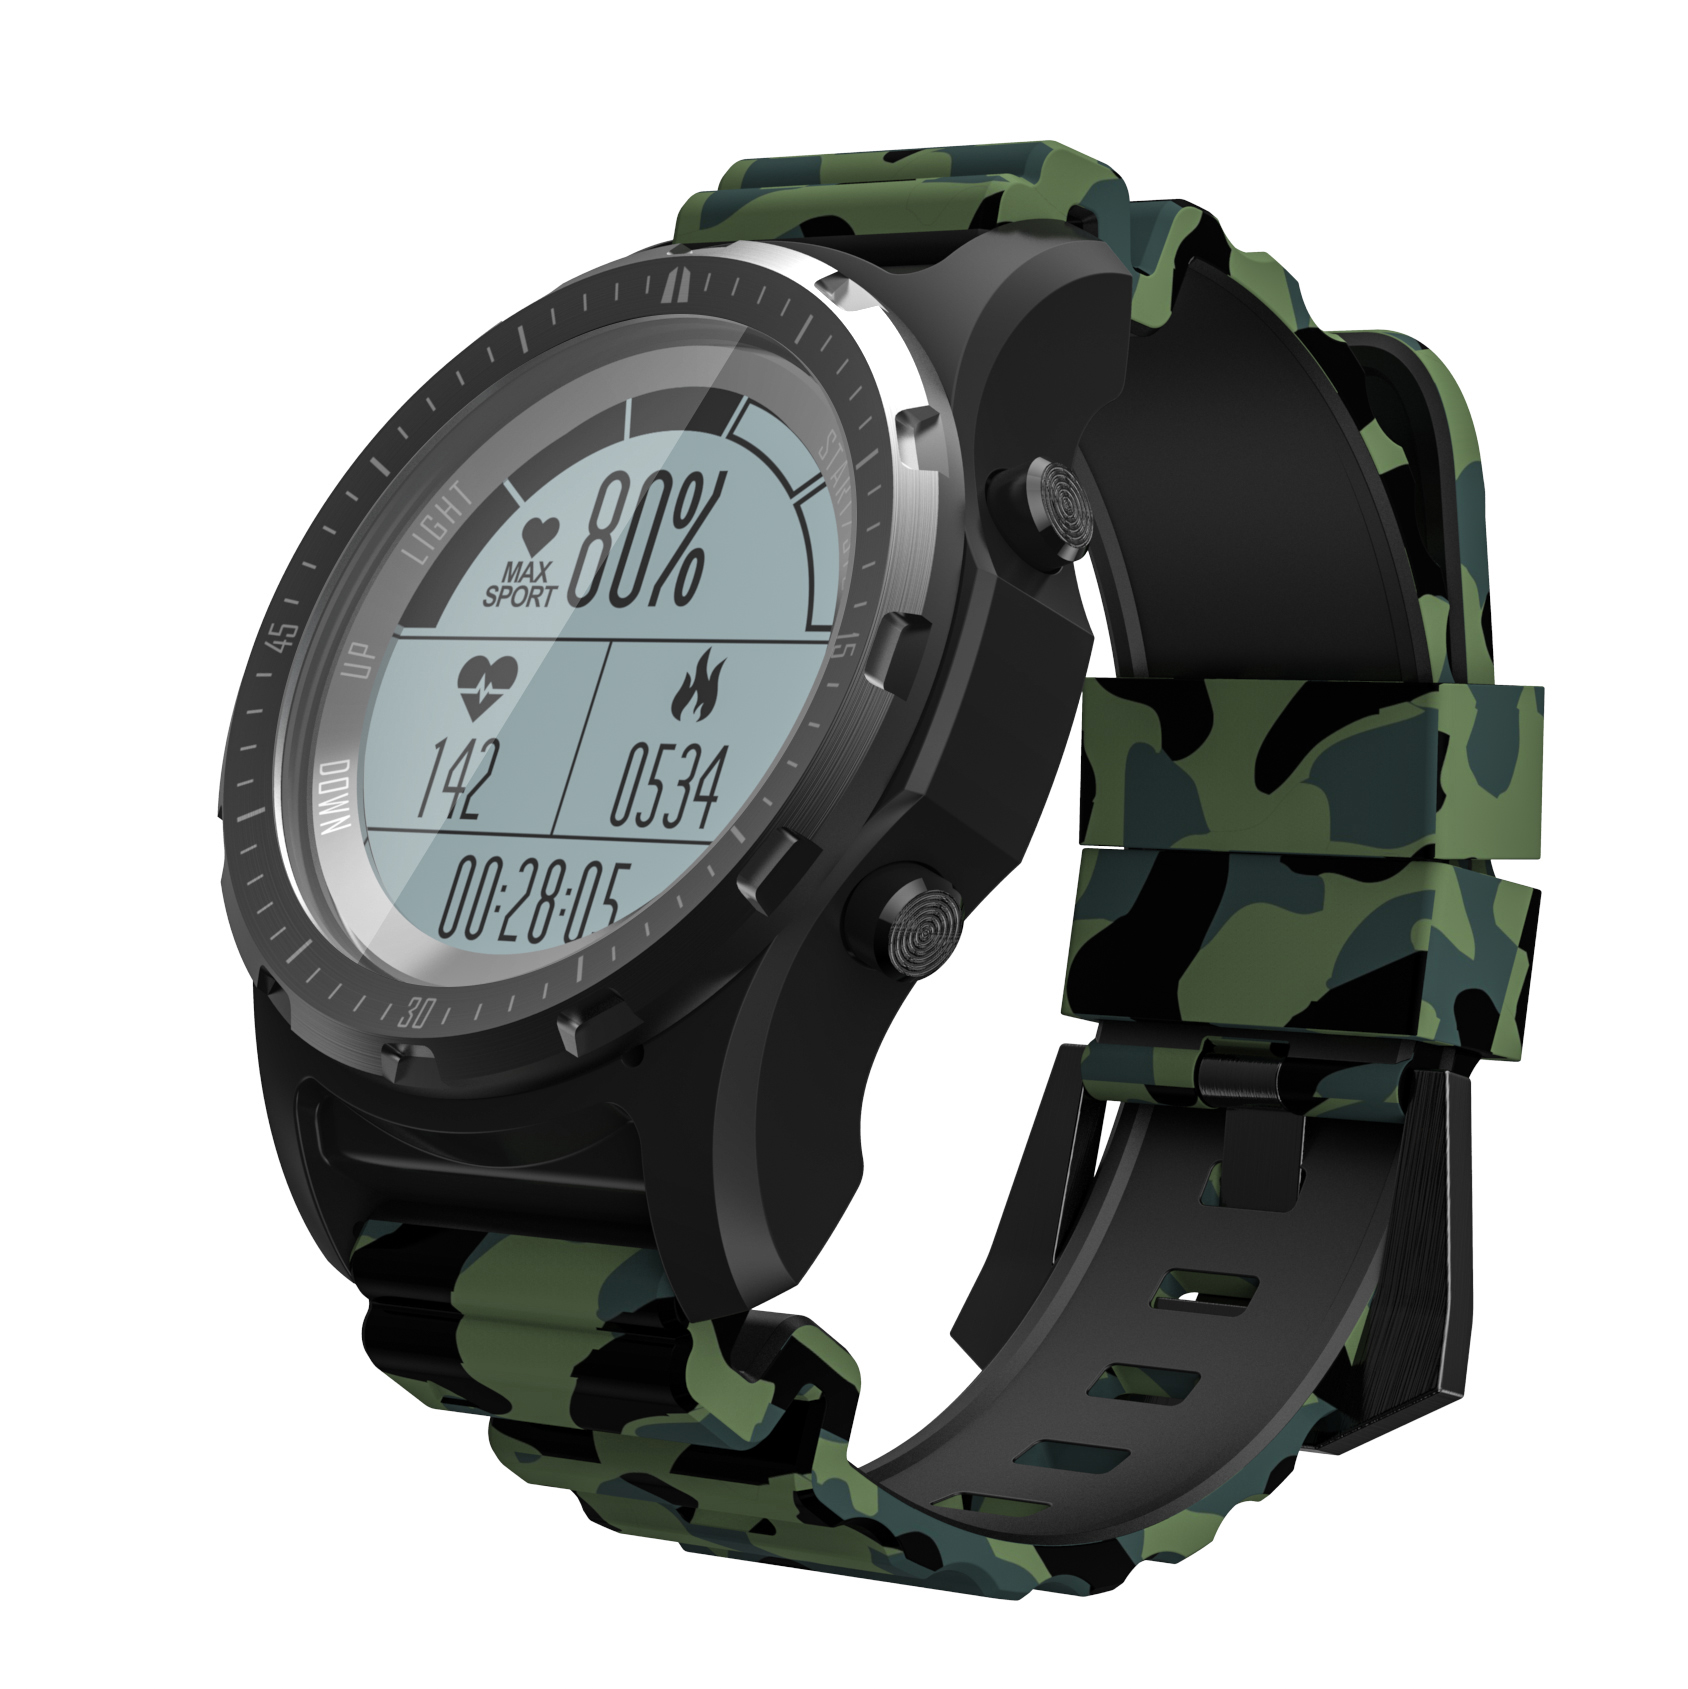 RUIJIE S966 GPS Smart Watch Waterproof Heart Rate Altitude Meter Temperature Multi-sport Men Cycling Running Sport Smartwatch